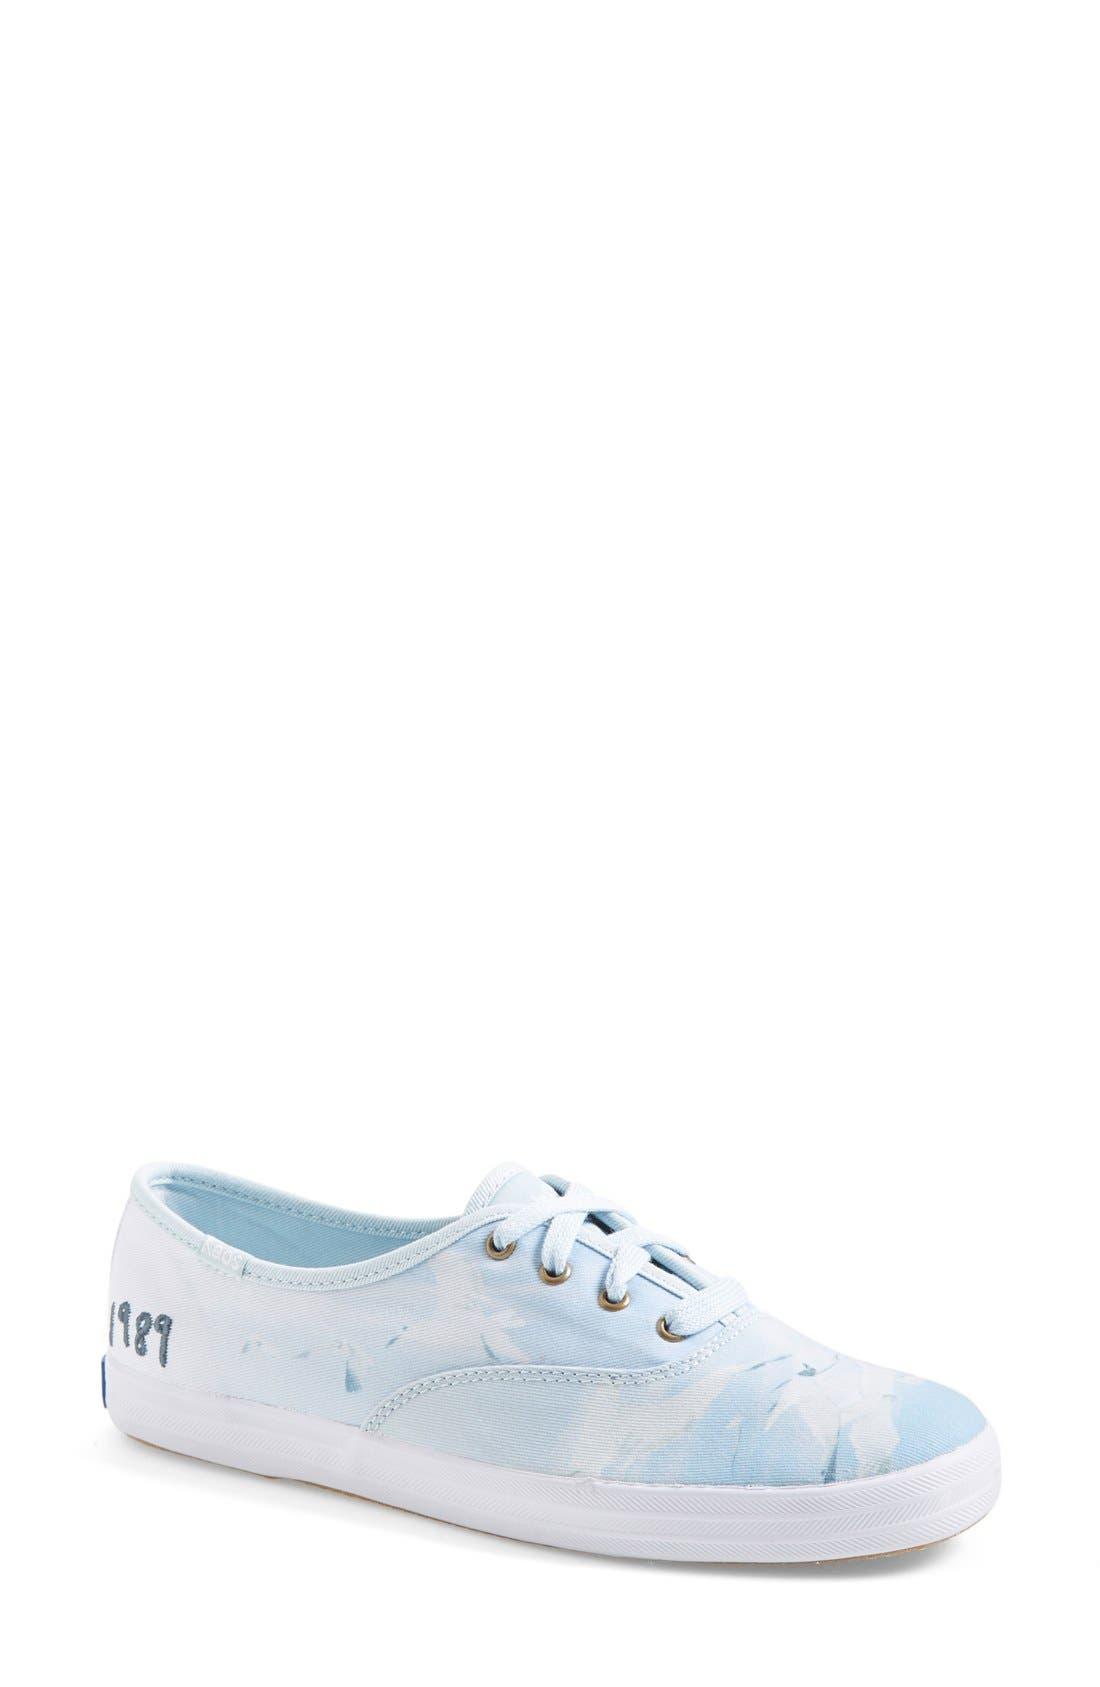 Main Image - Keds® Taylor Swift 'Champion -1989' Sneaker (Women)